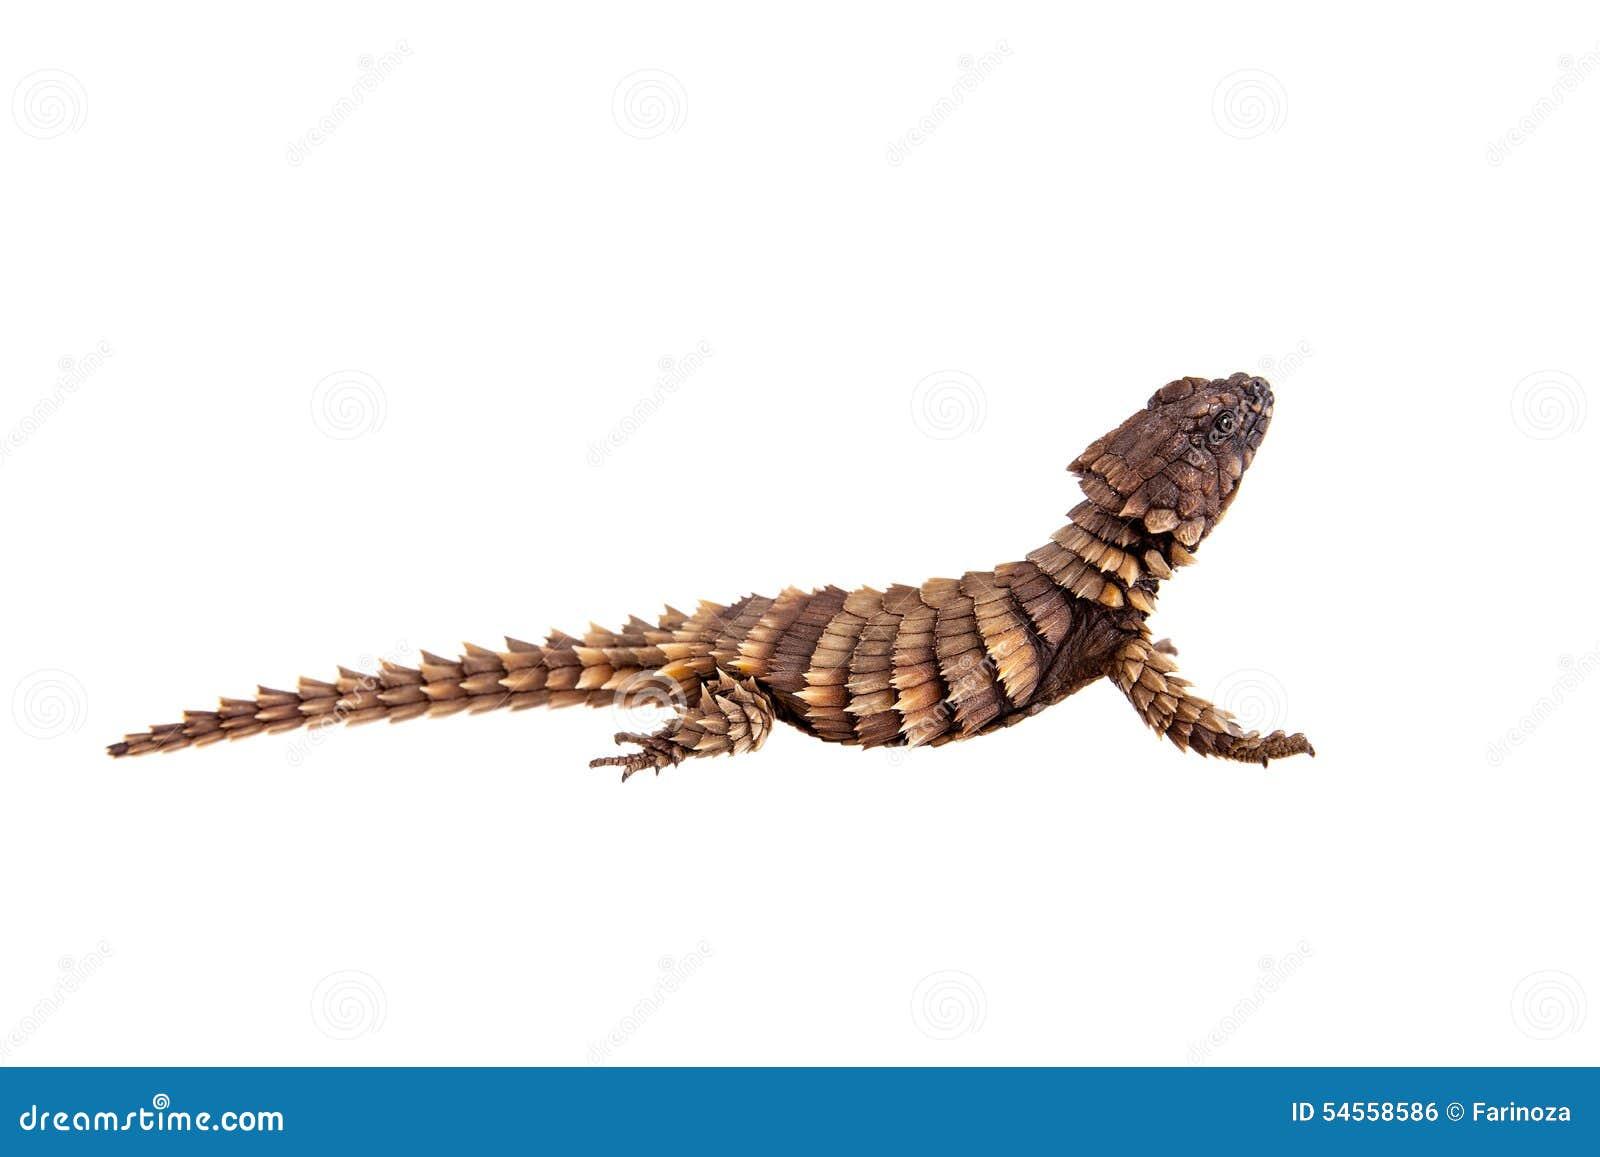 The Armadillo Girdled Lizard On White Stock Photo - Image of africa